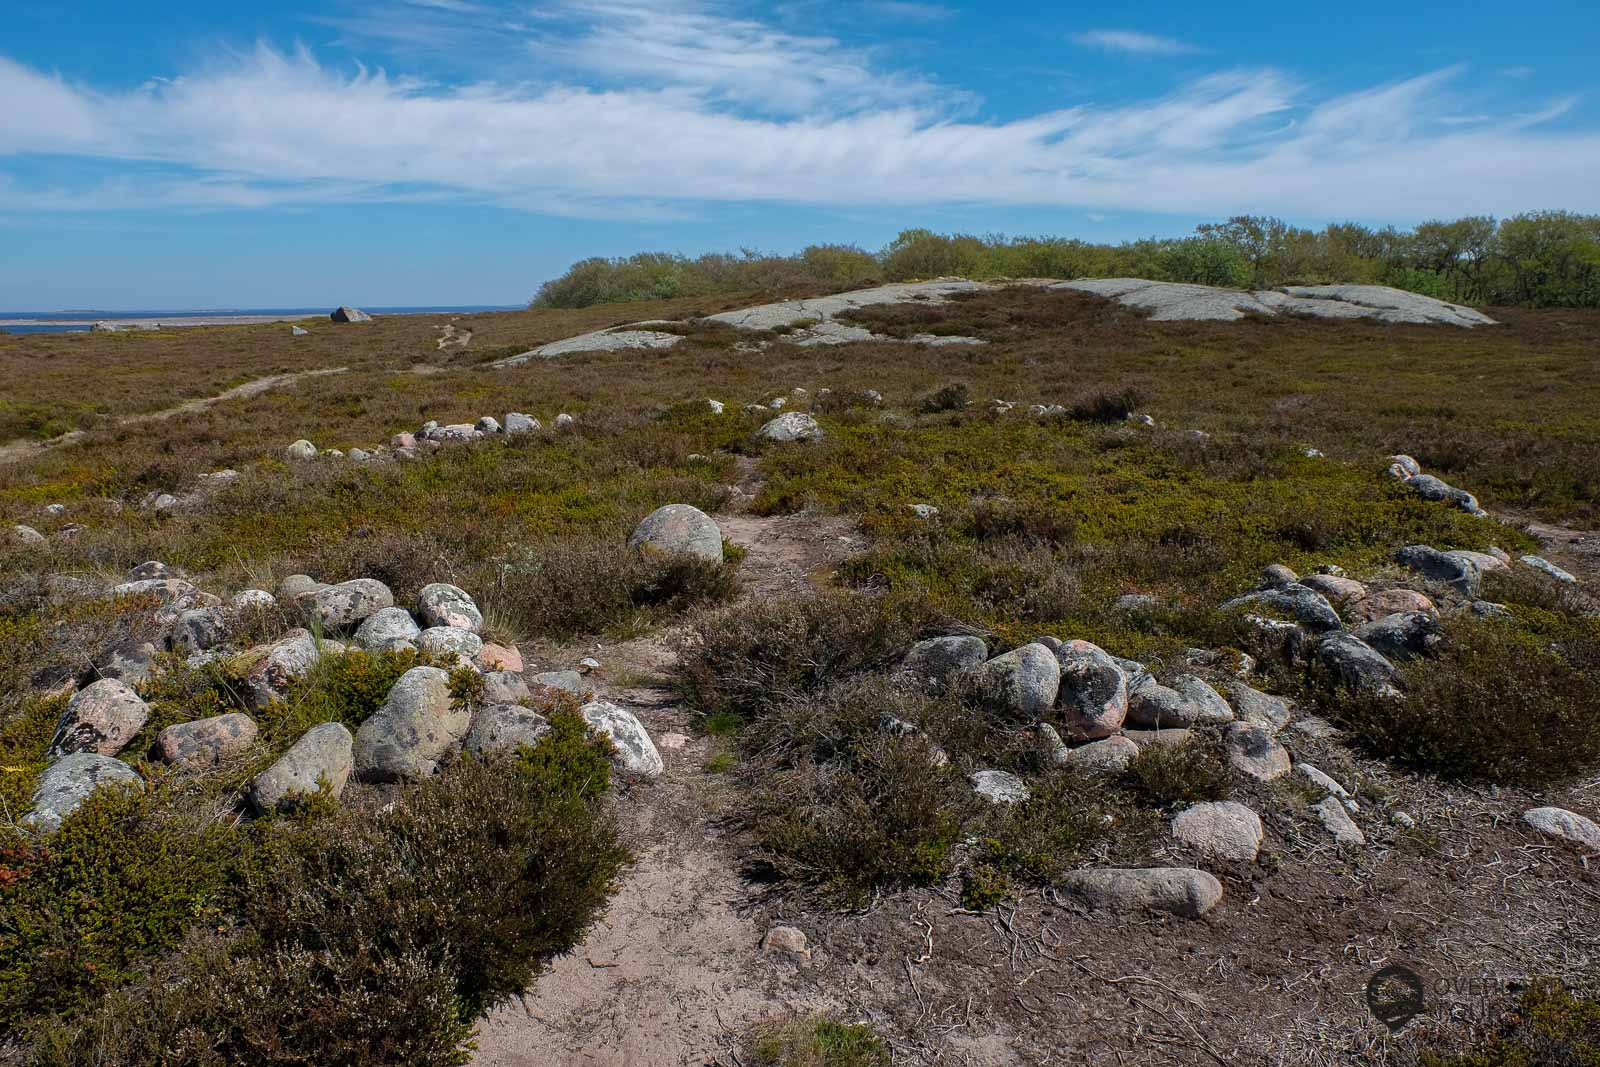 Jurmo Island - Finish Archipelago